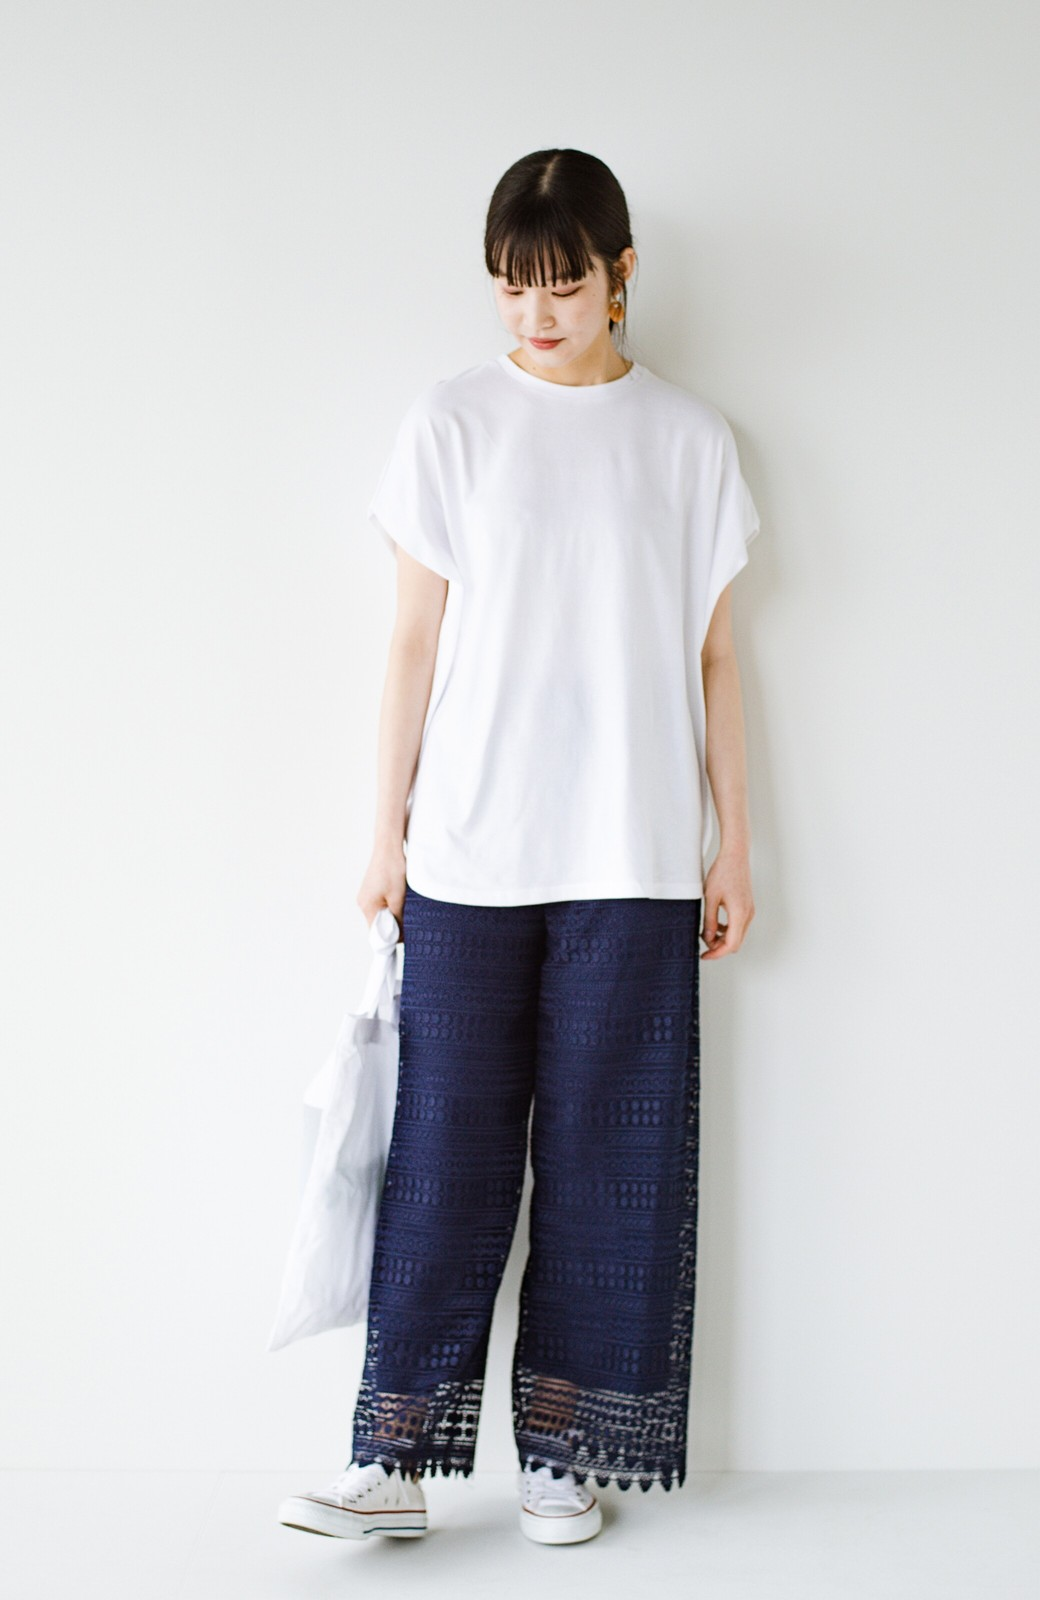 haco! PBPオーガニックコットン 楽ちんなのにブラウス気分で着られる大人のおめかしTシャツ <ホワイト>の商品写真13